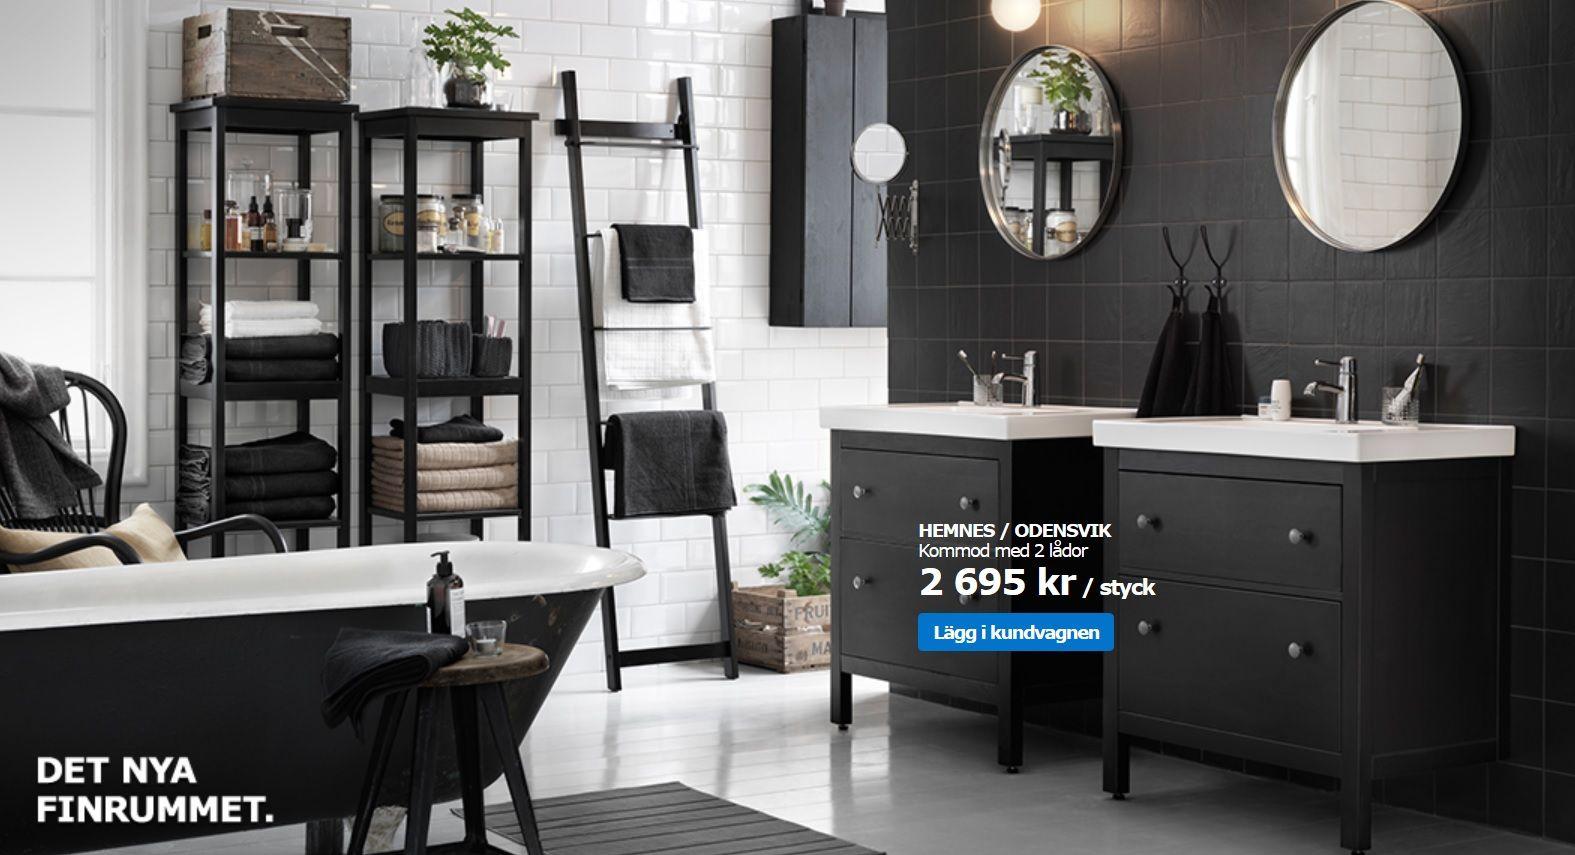 Ikea Hemnes Serien Ikea Badezimmer Bad Inspiration Inneneinrichtung